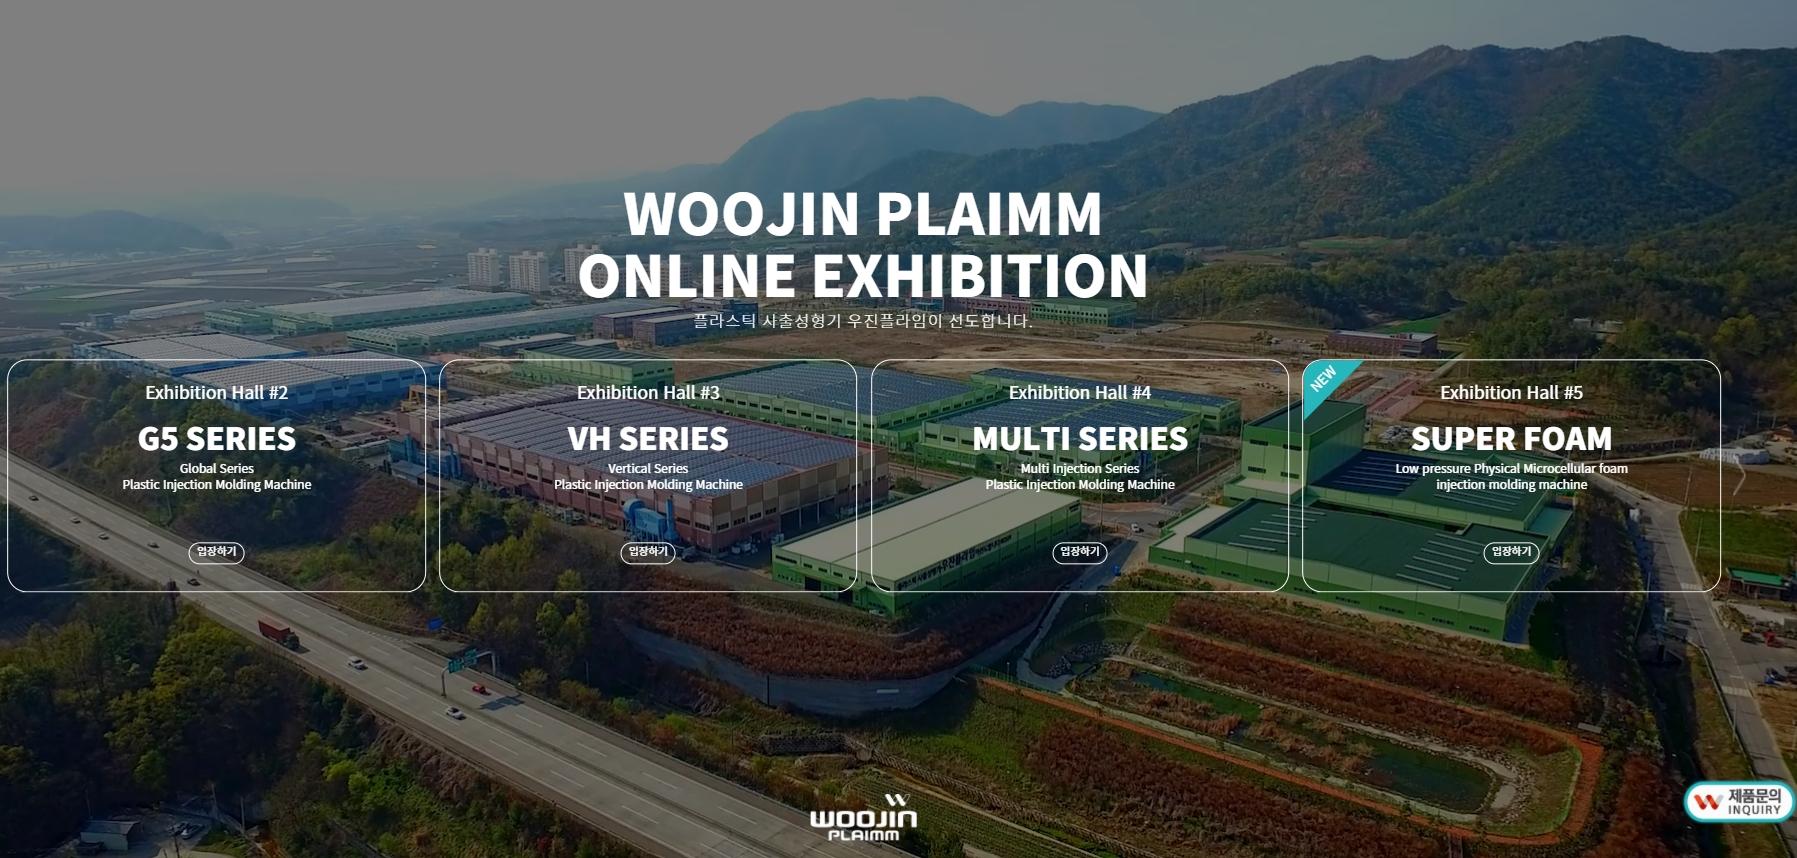 Woojin Plaimm online exhibition